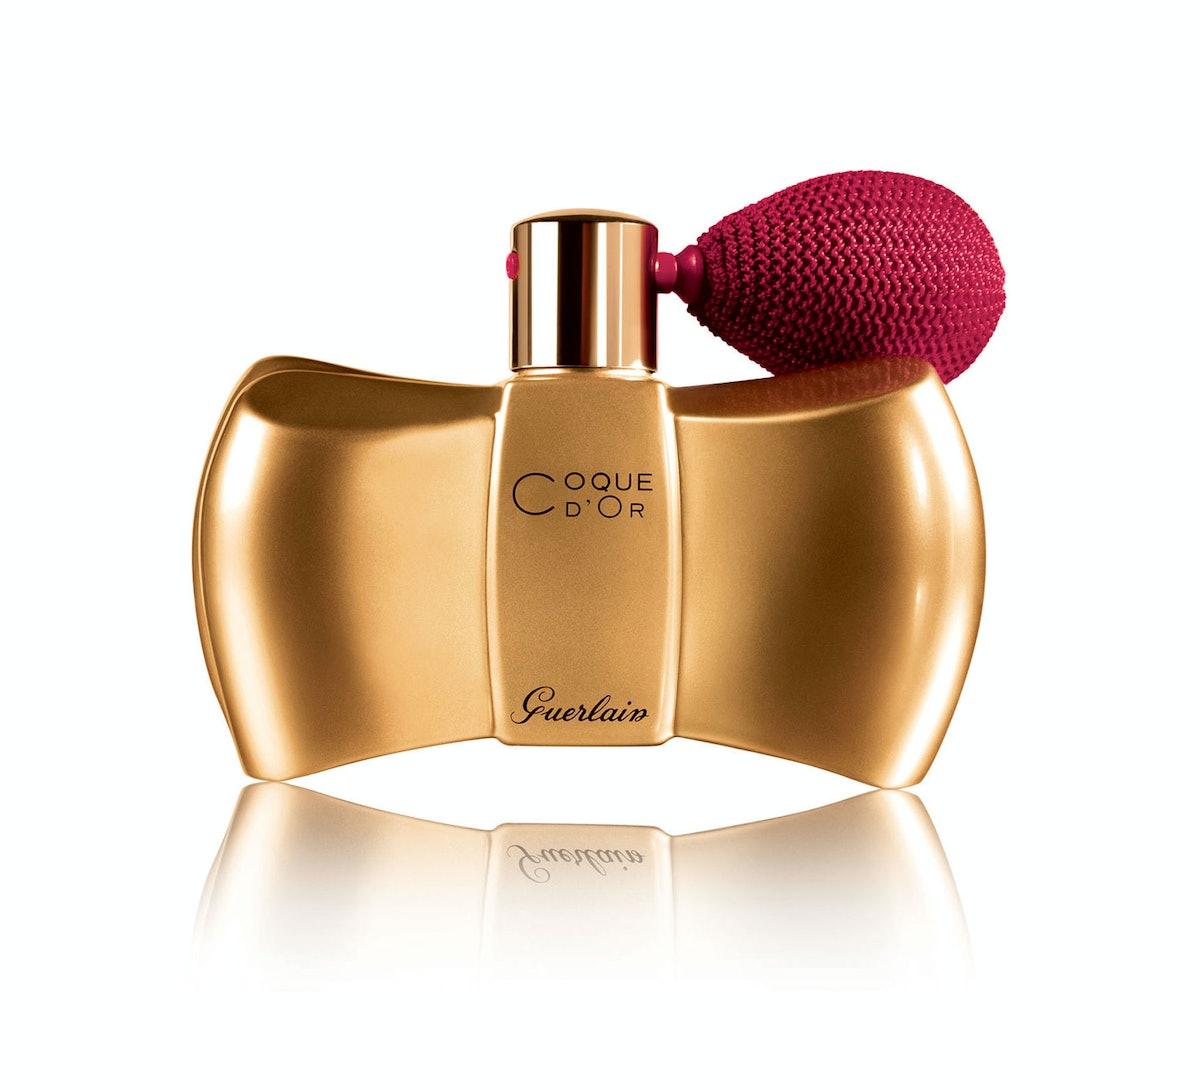 Guerlain Coquette d'Or Perfumed Shimmer Powder